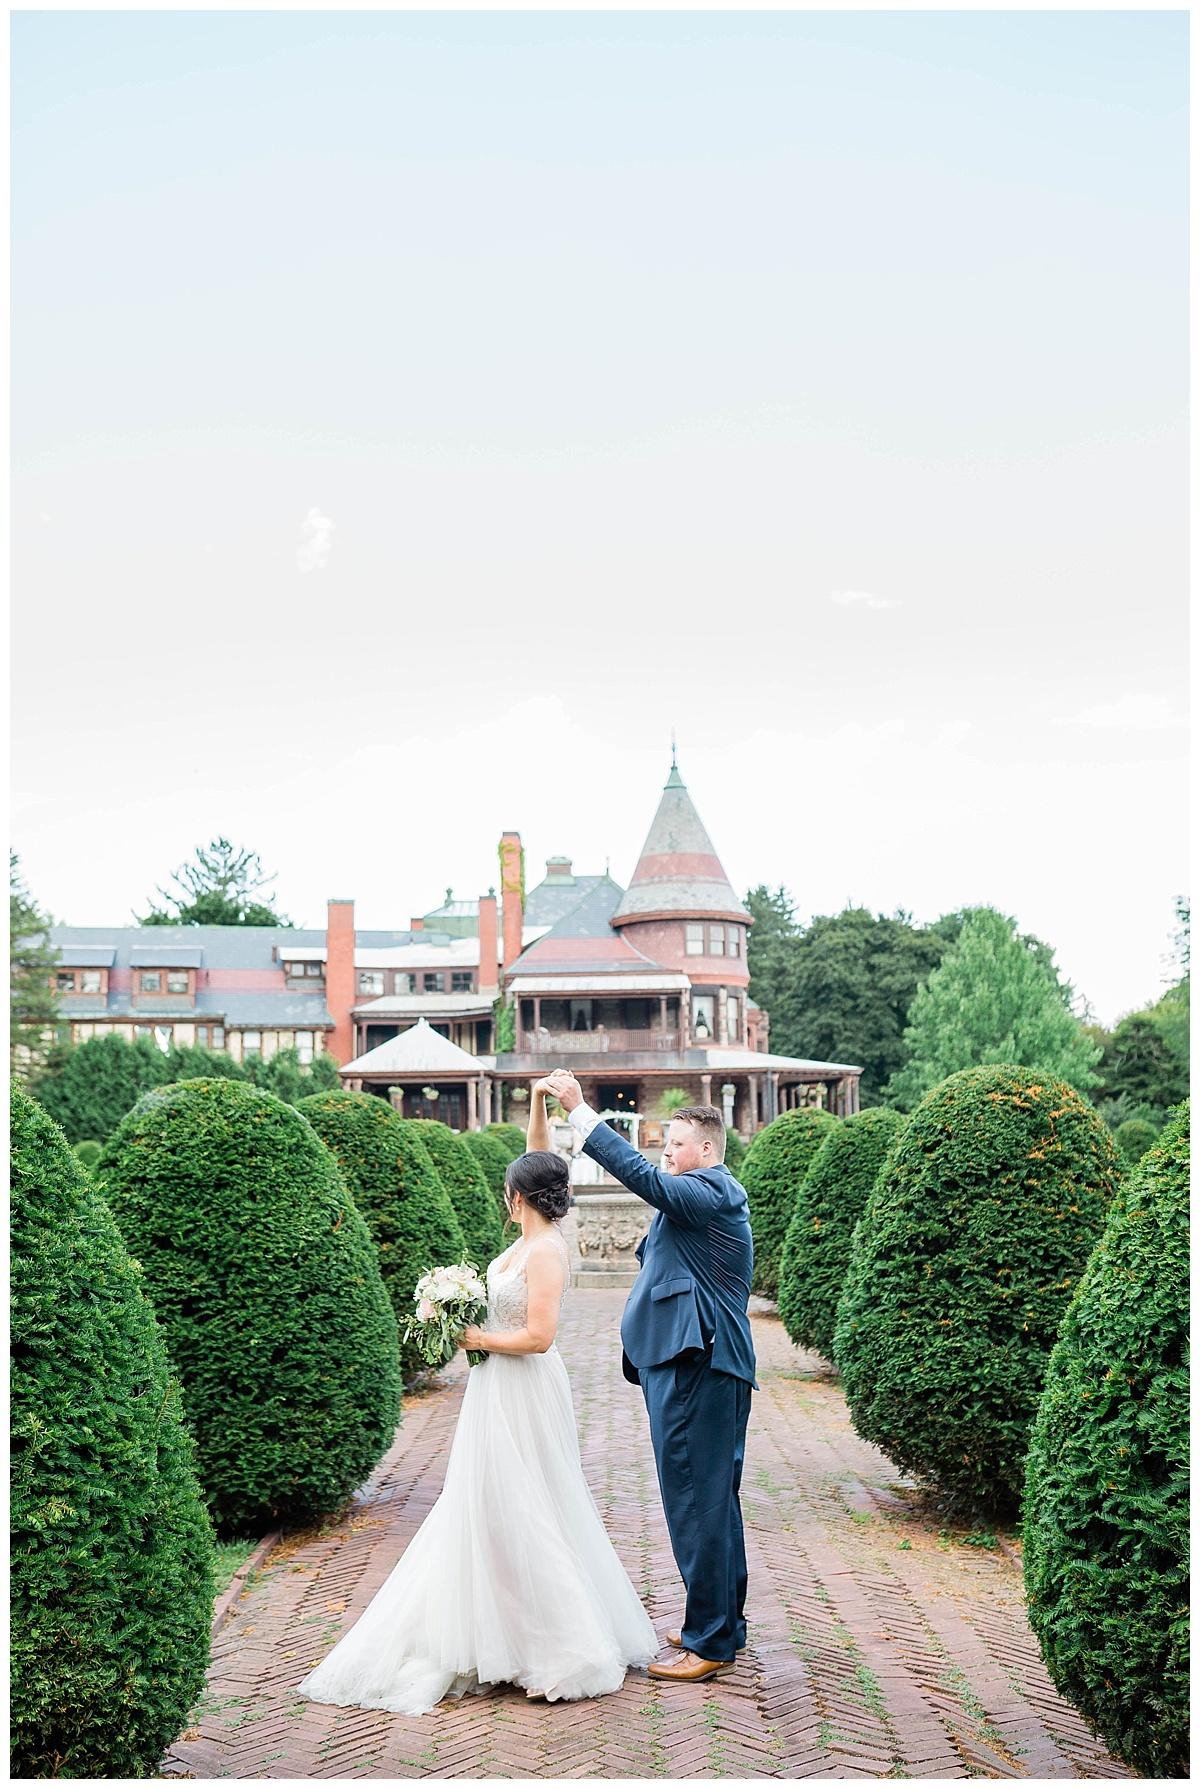 Rachel and Nick - Sonnenberg Gardens Wedding-390.jpg